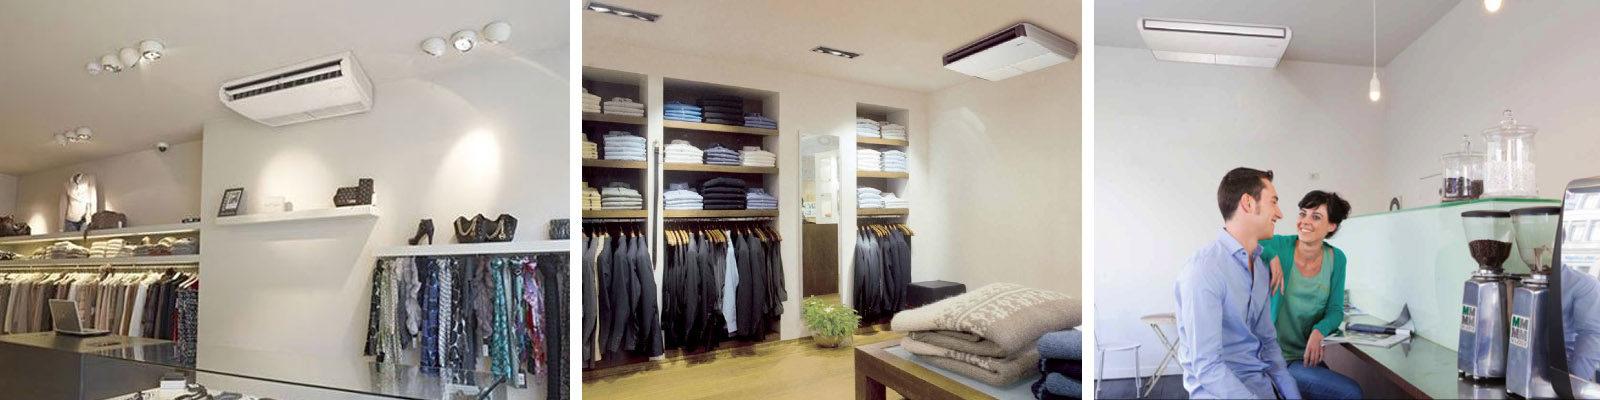 climweb bien choisir sa climatisation. Black Bedroom Furniture Sets. Home Design Ideas